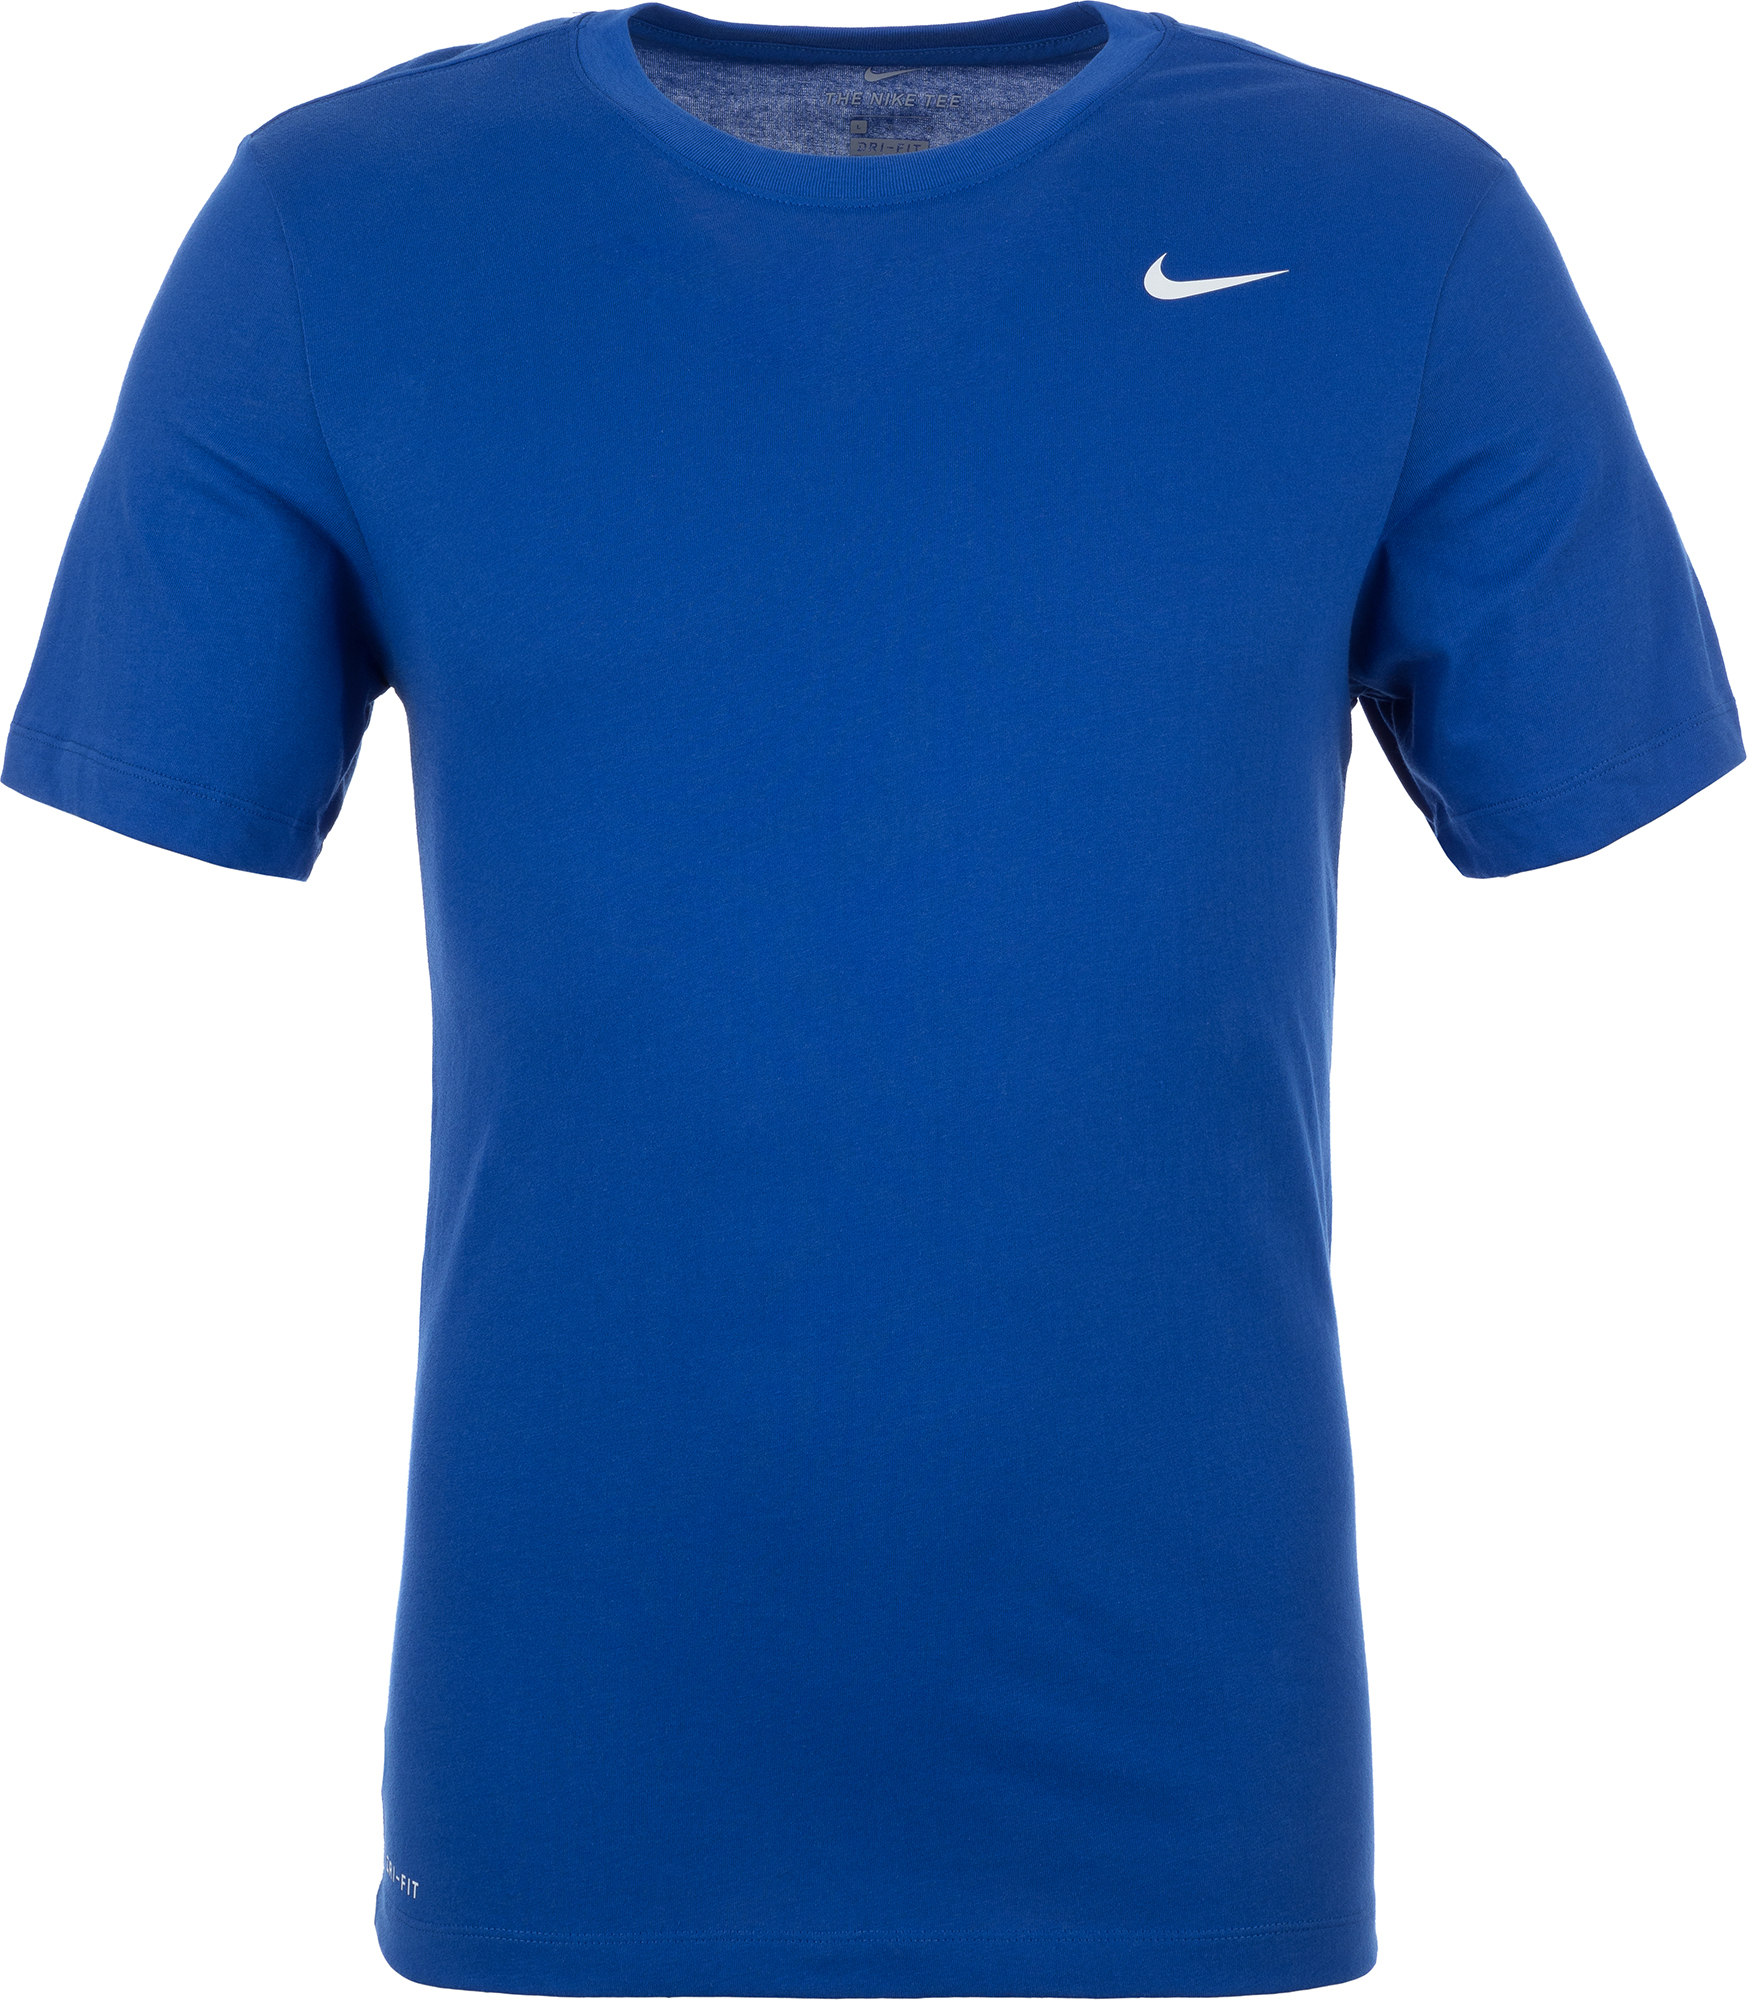 Nike Футболка мужская  Dri-FIT, размер 52-54